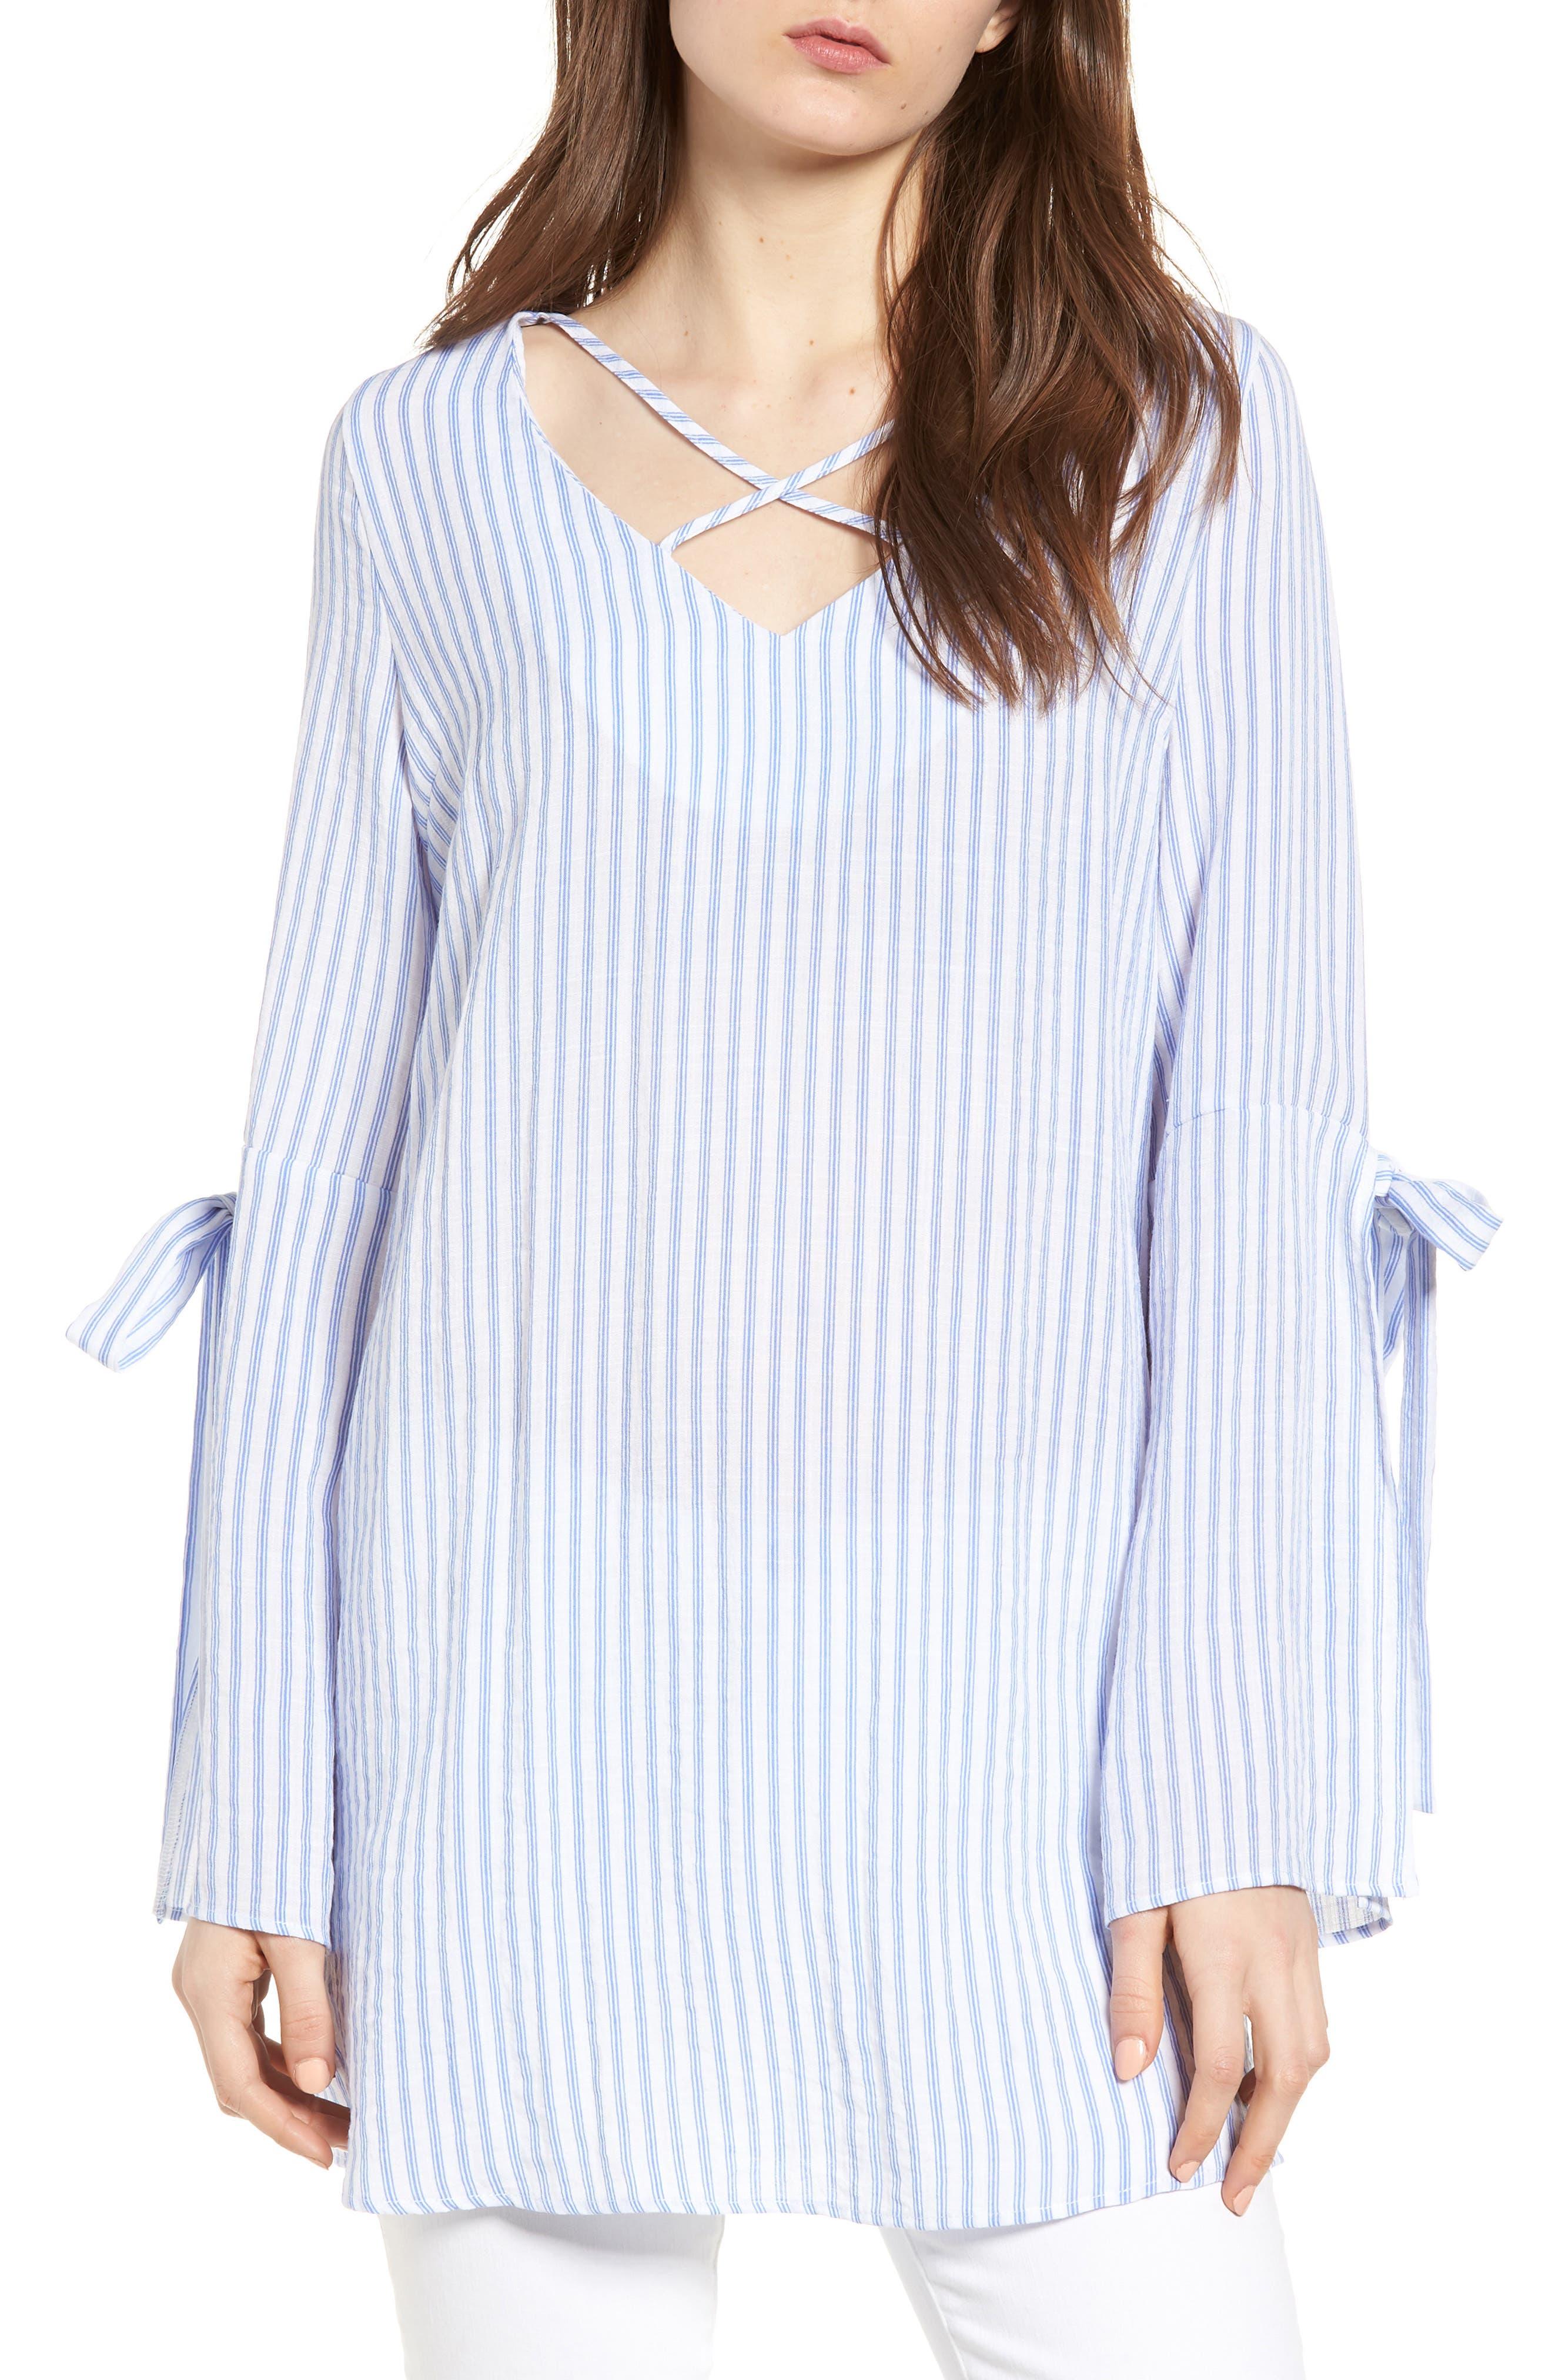 Bishop + Young Stripe Tunic Top,                             Main thumbnail 1, color,                             Blue White Stripe